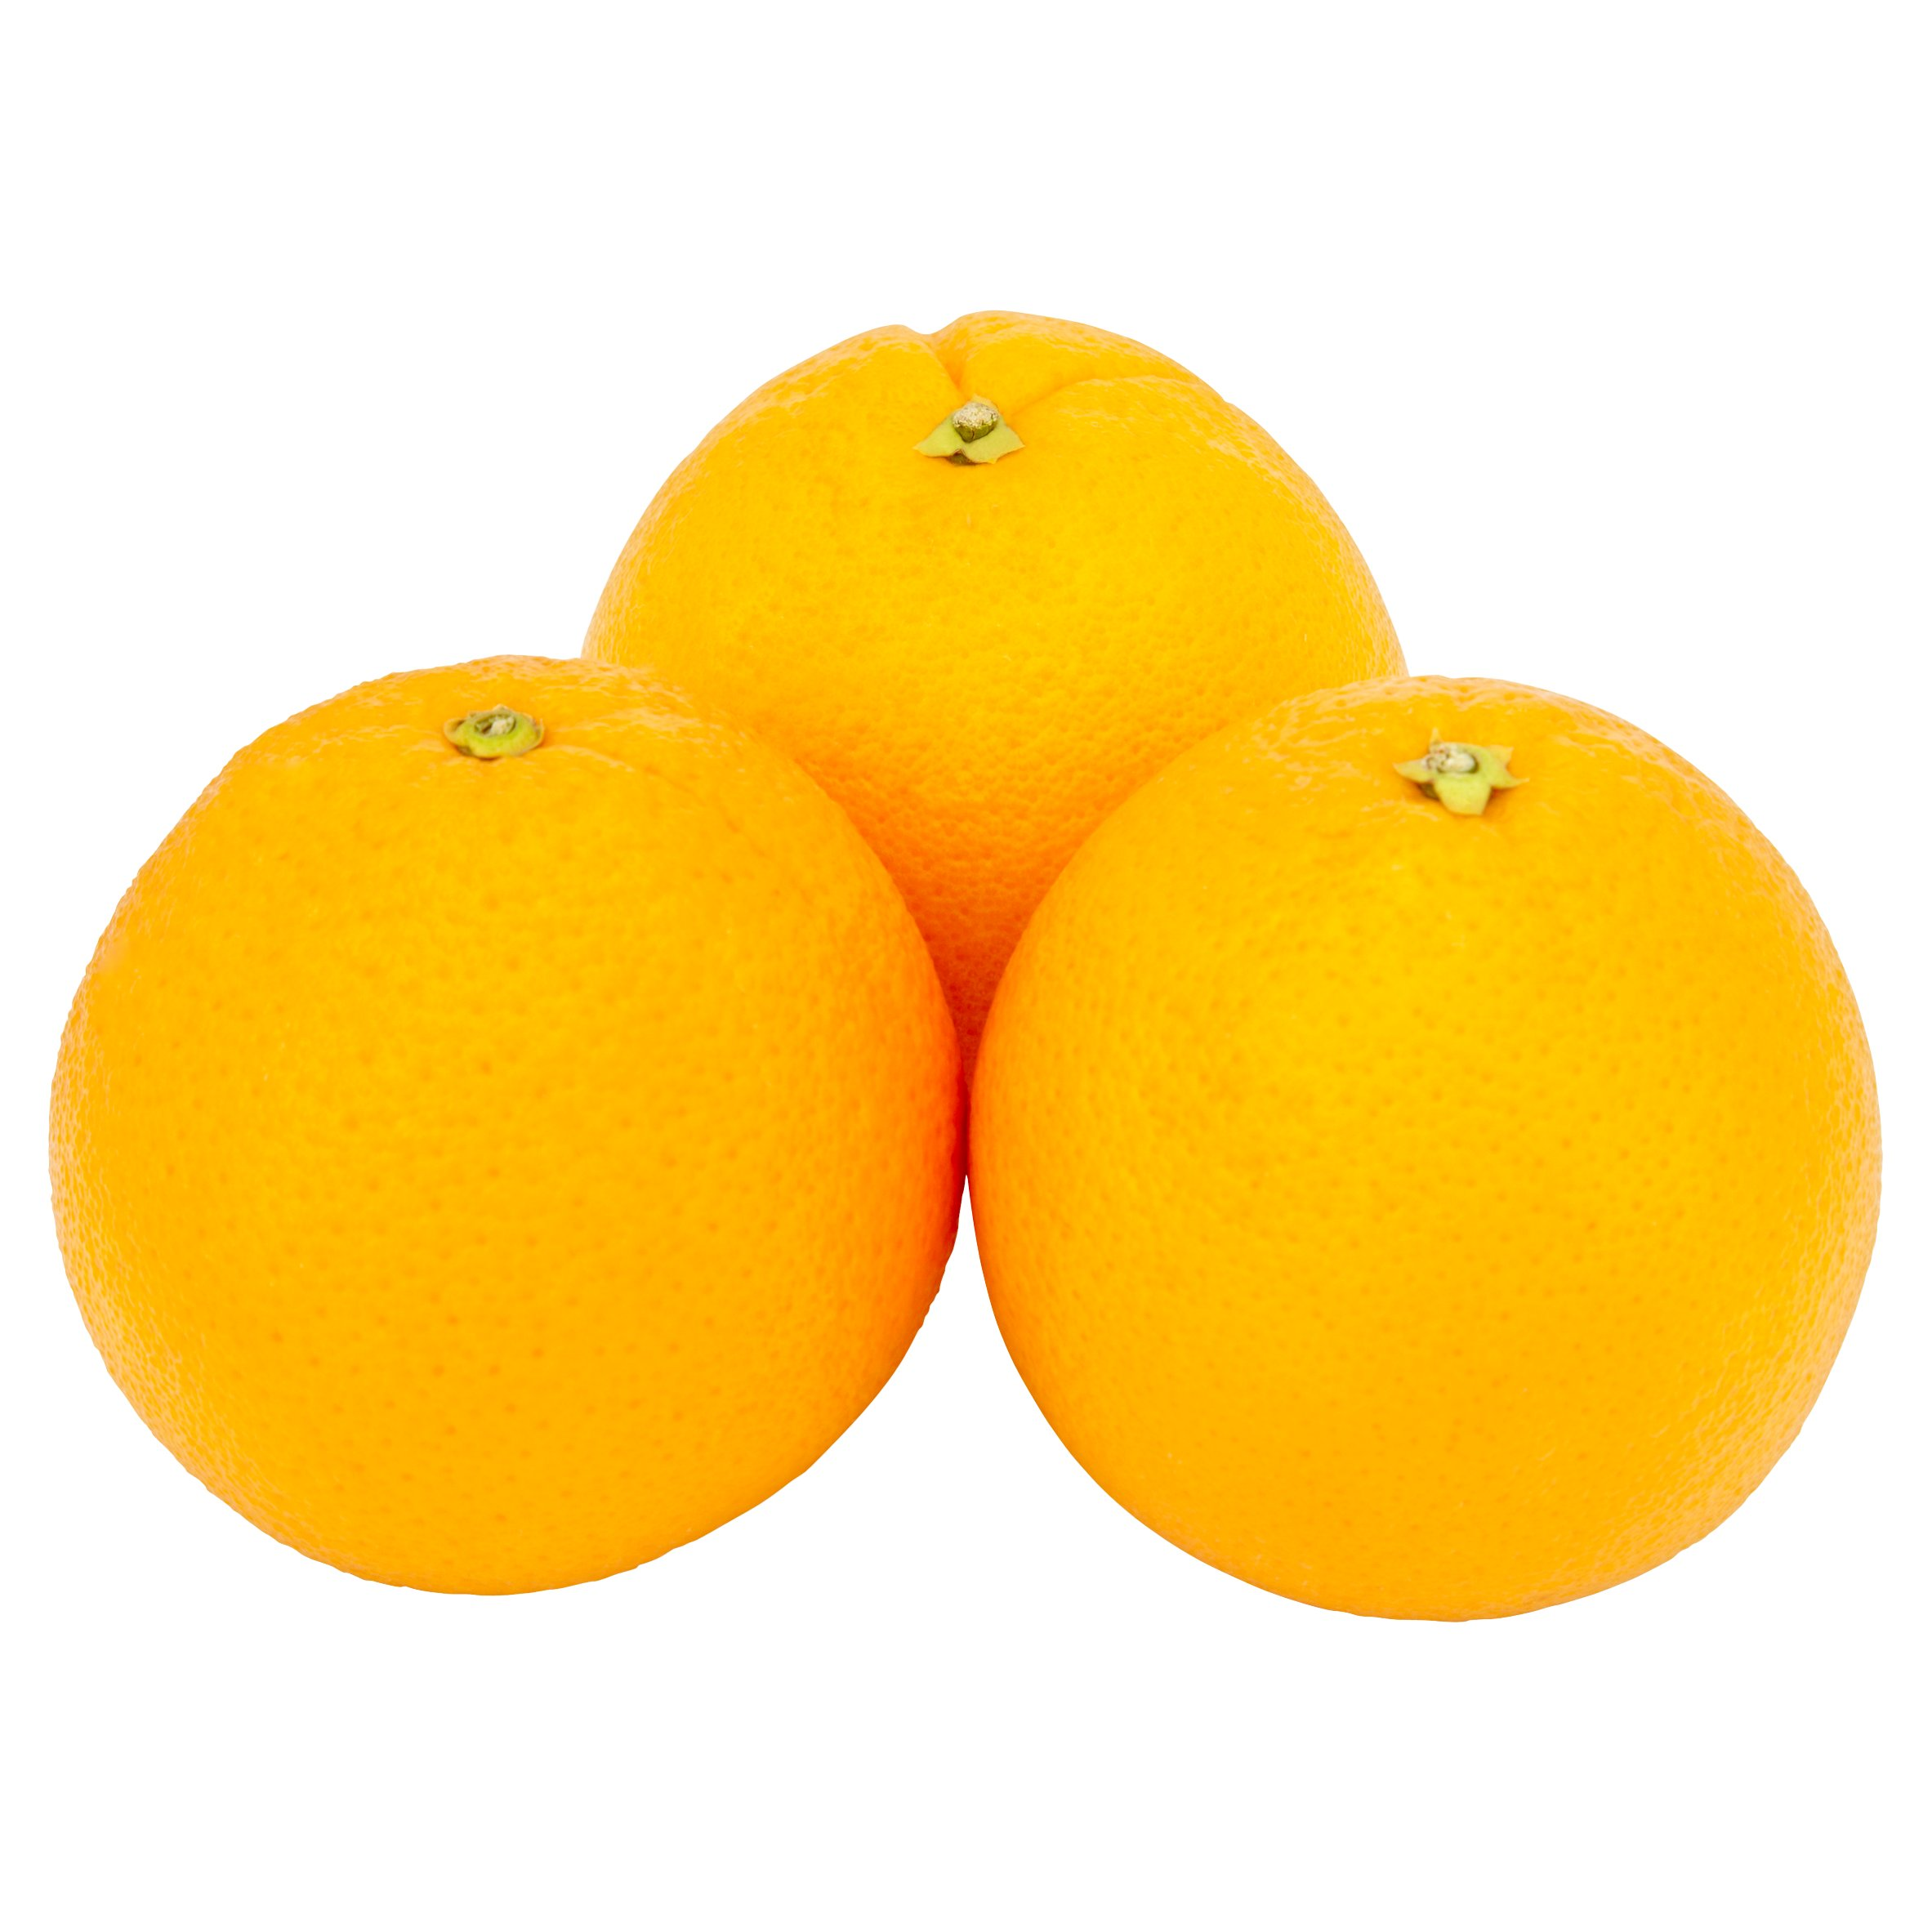 Oranges Each